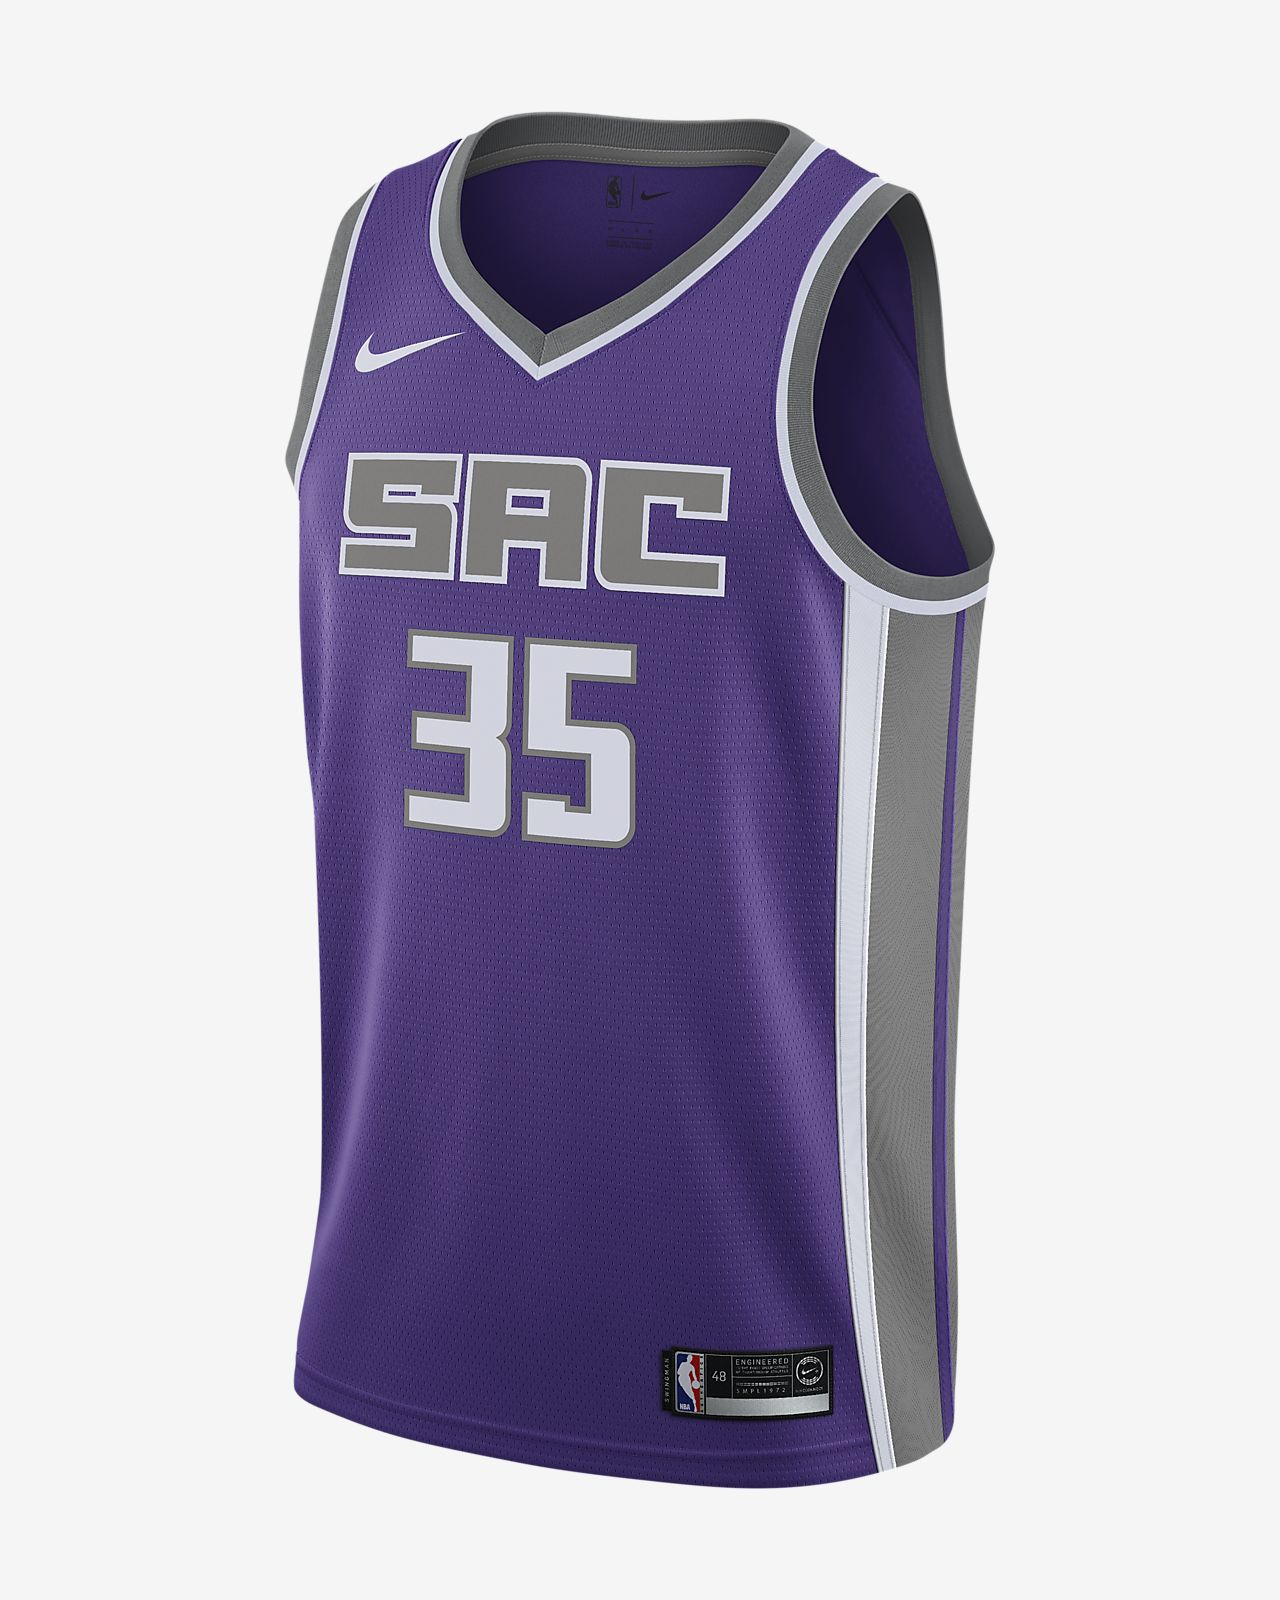 85500d8dad1b Men s Nike NBA Connected Jersey. Marvin Bagley Iii Icon Edition Swingman (Sacramento  Kings)